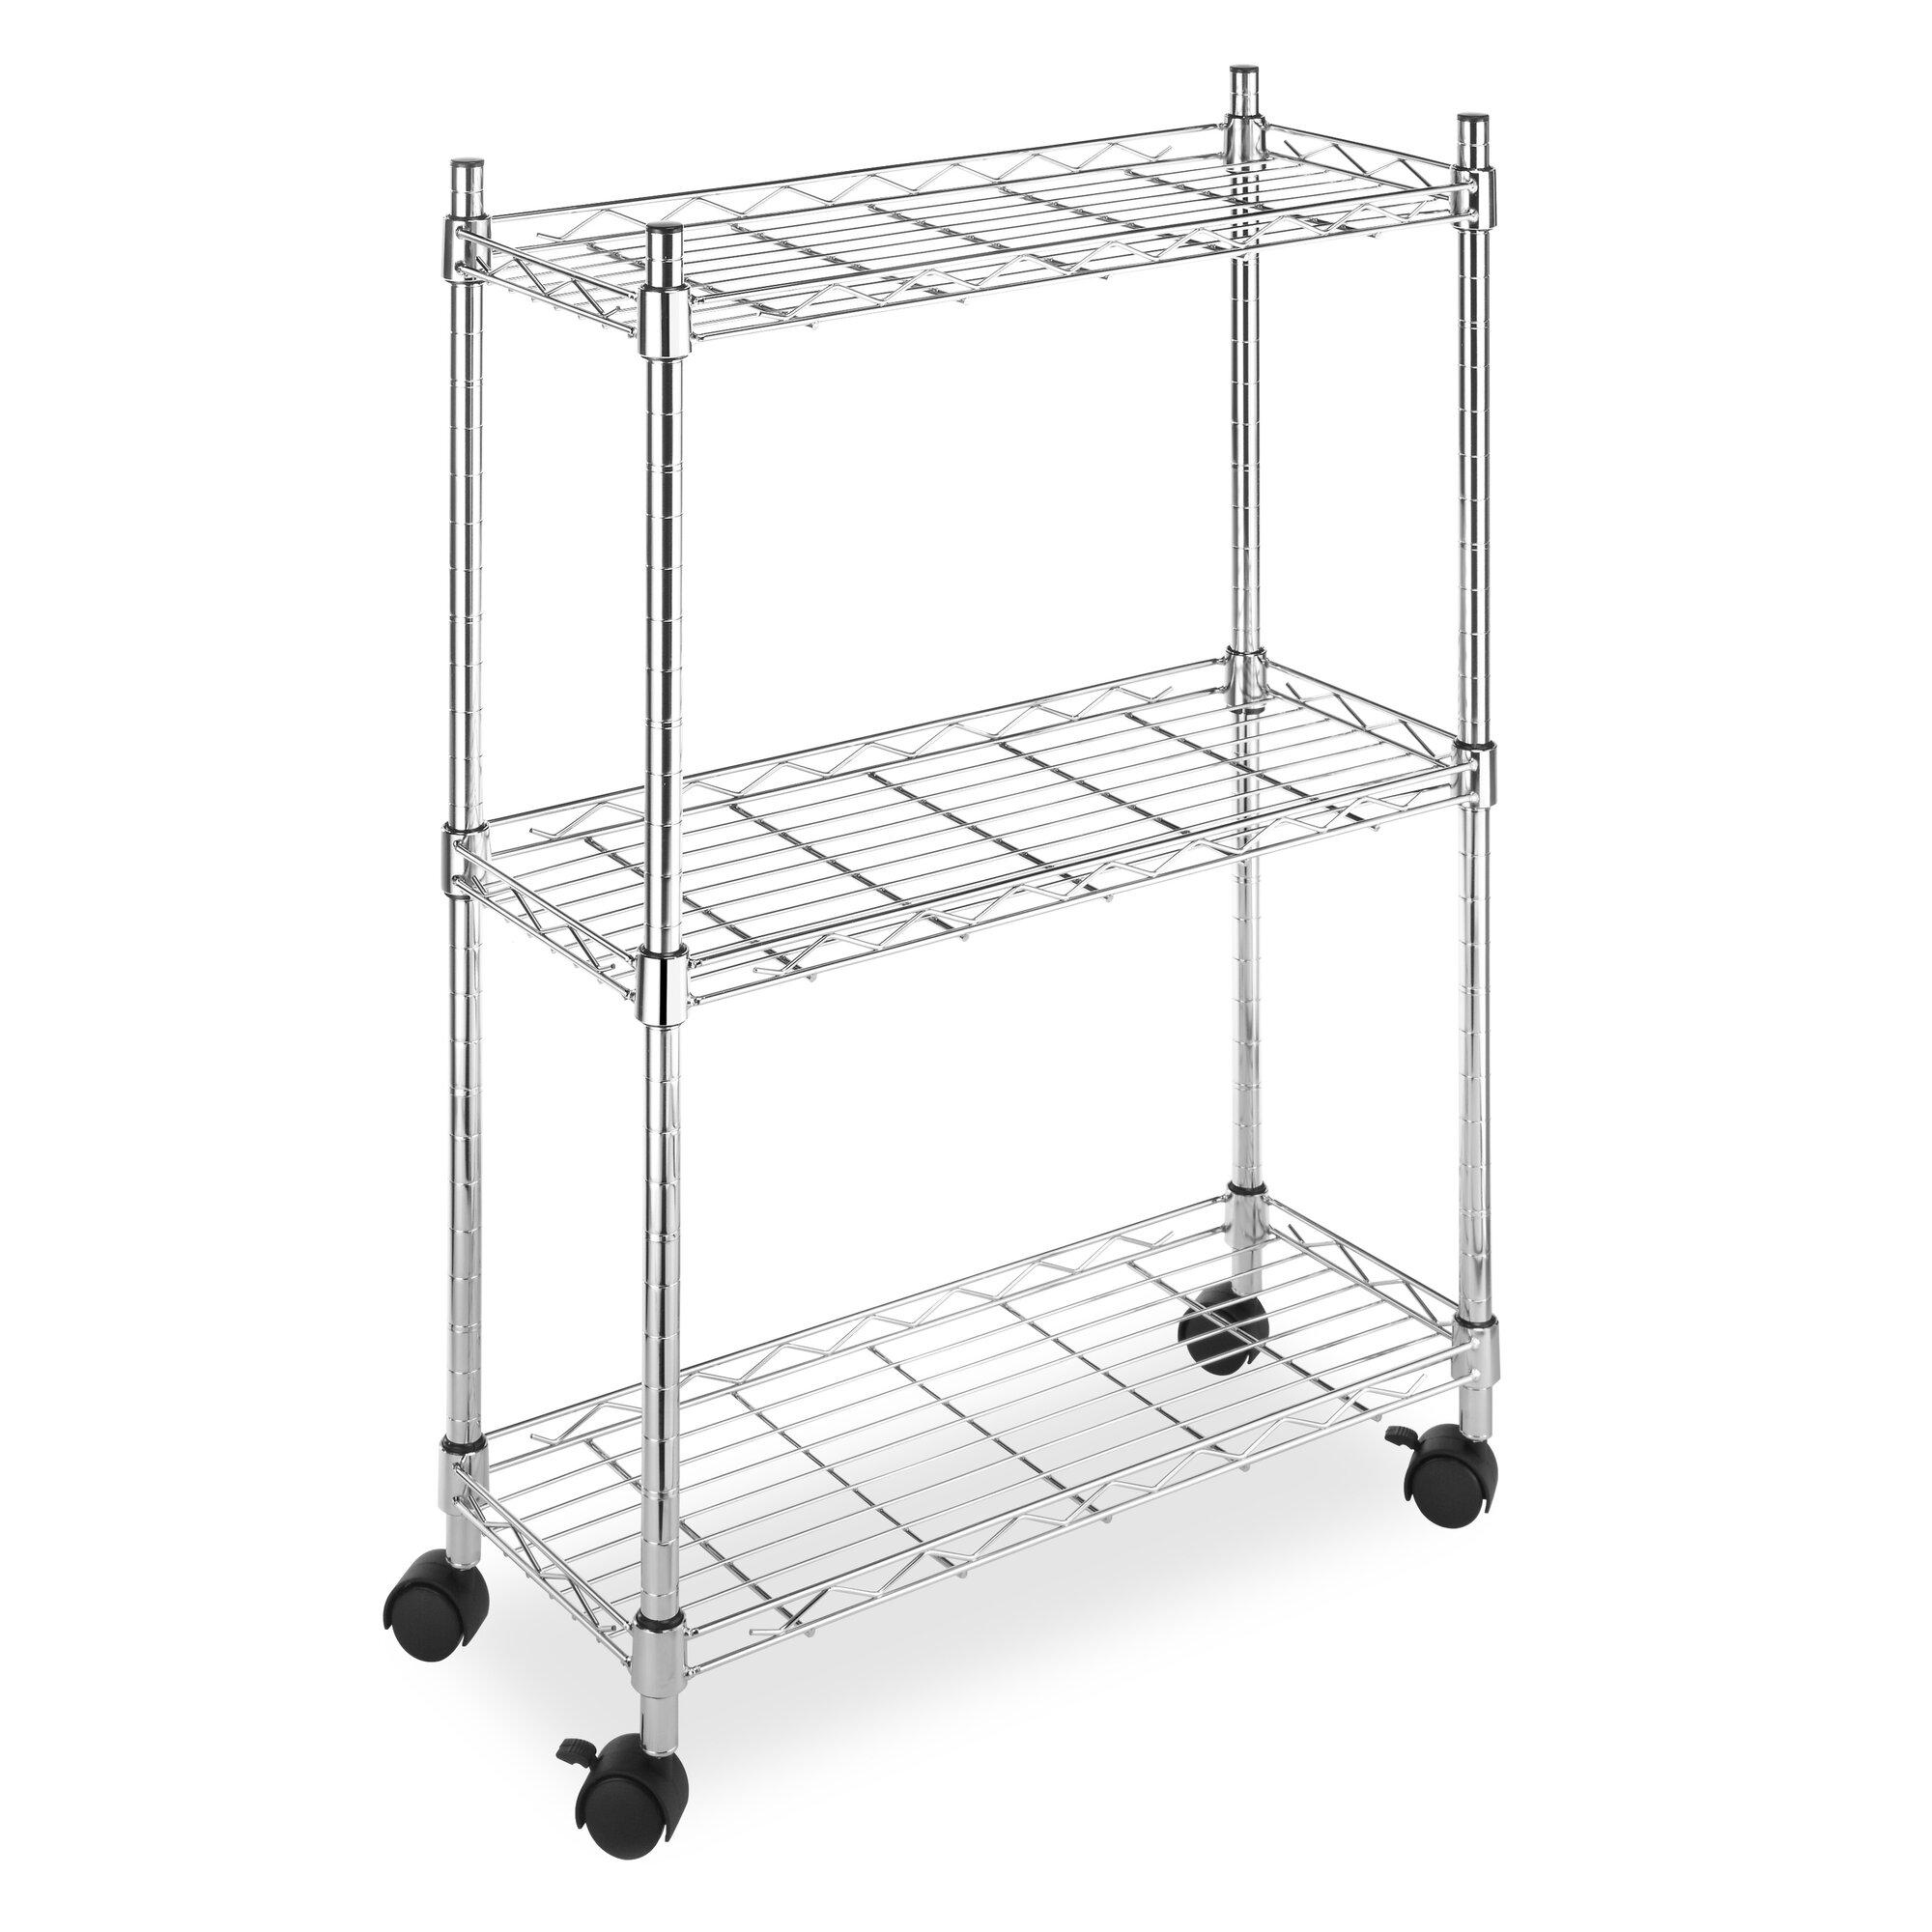 supreme 3 tier laundry cart - Laundry Carts